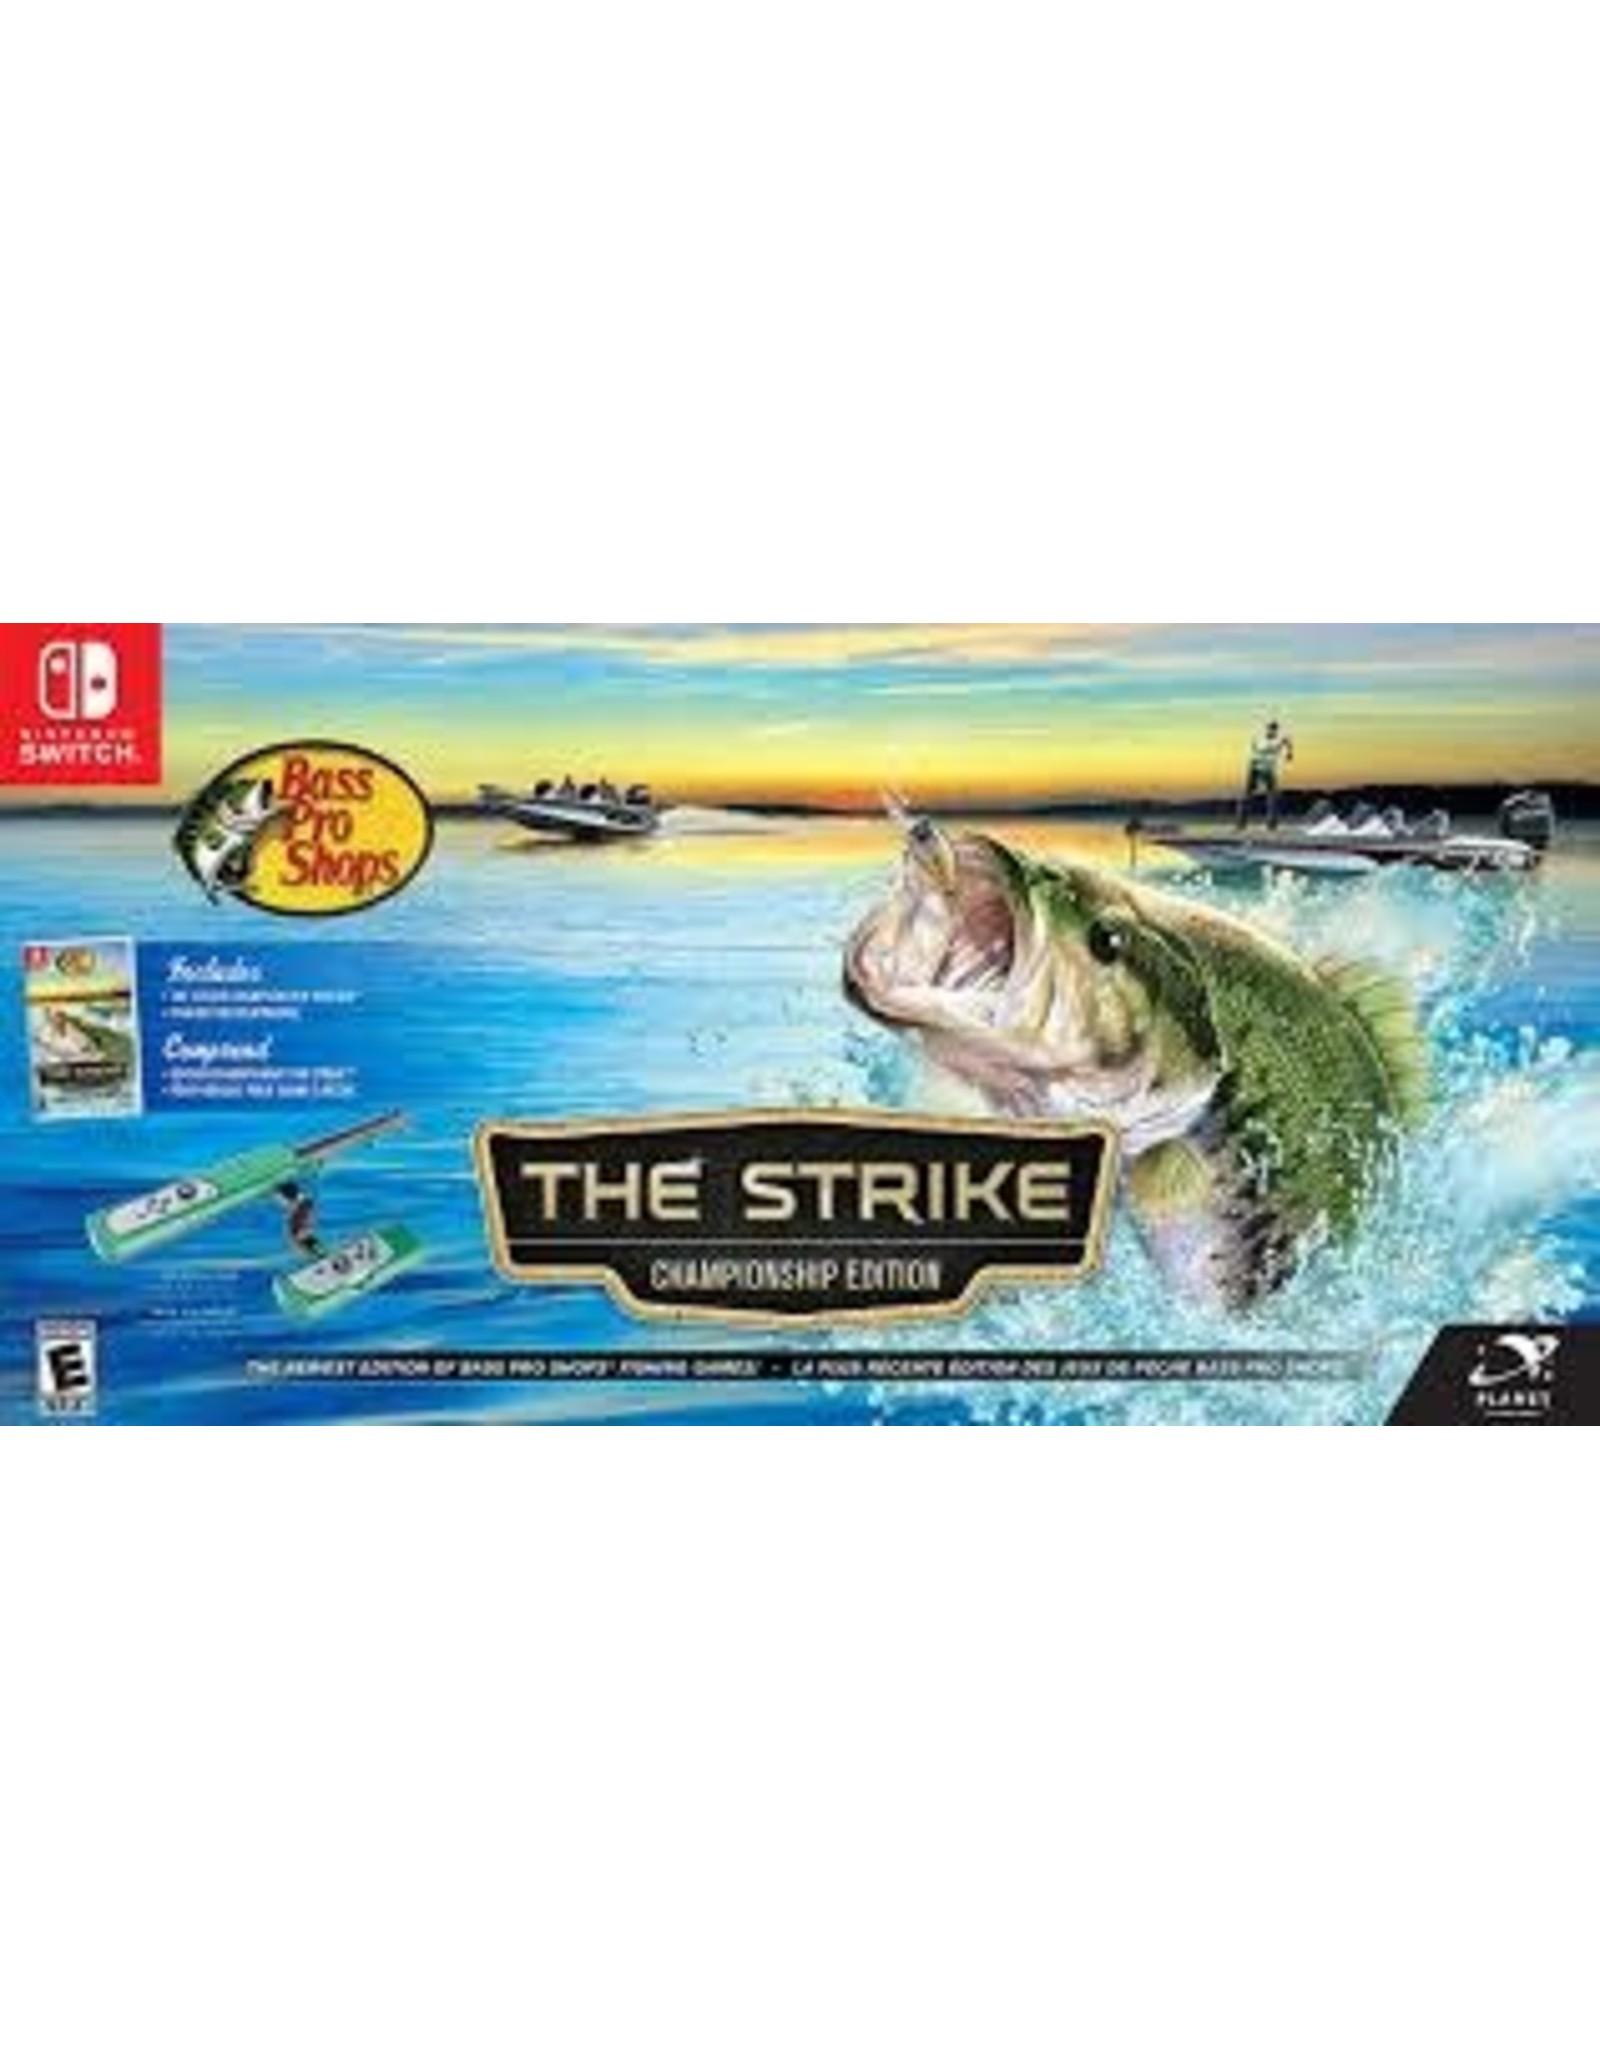 Nintendo Switch Bass pro Shop The Strike bundle Includes Rod